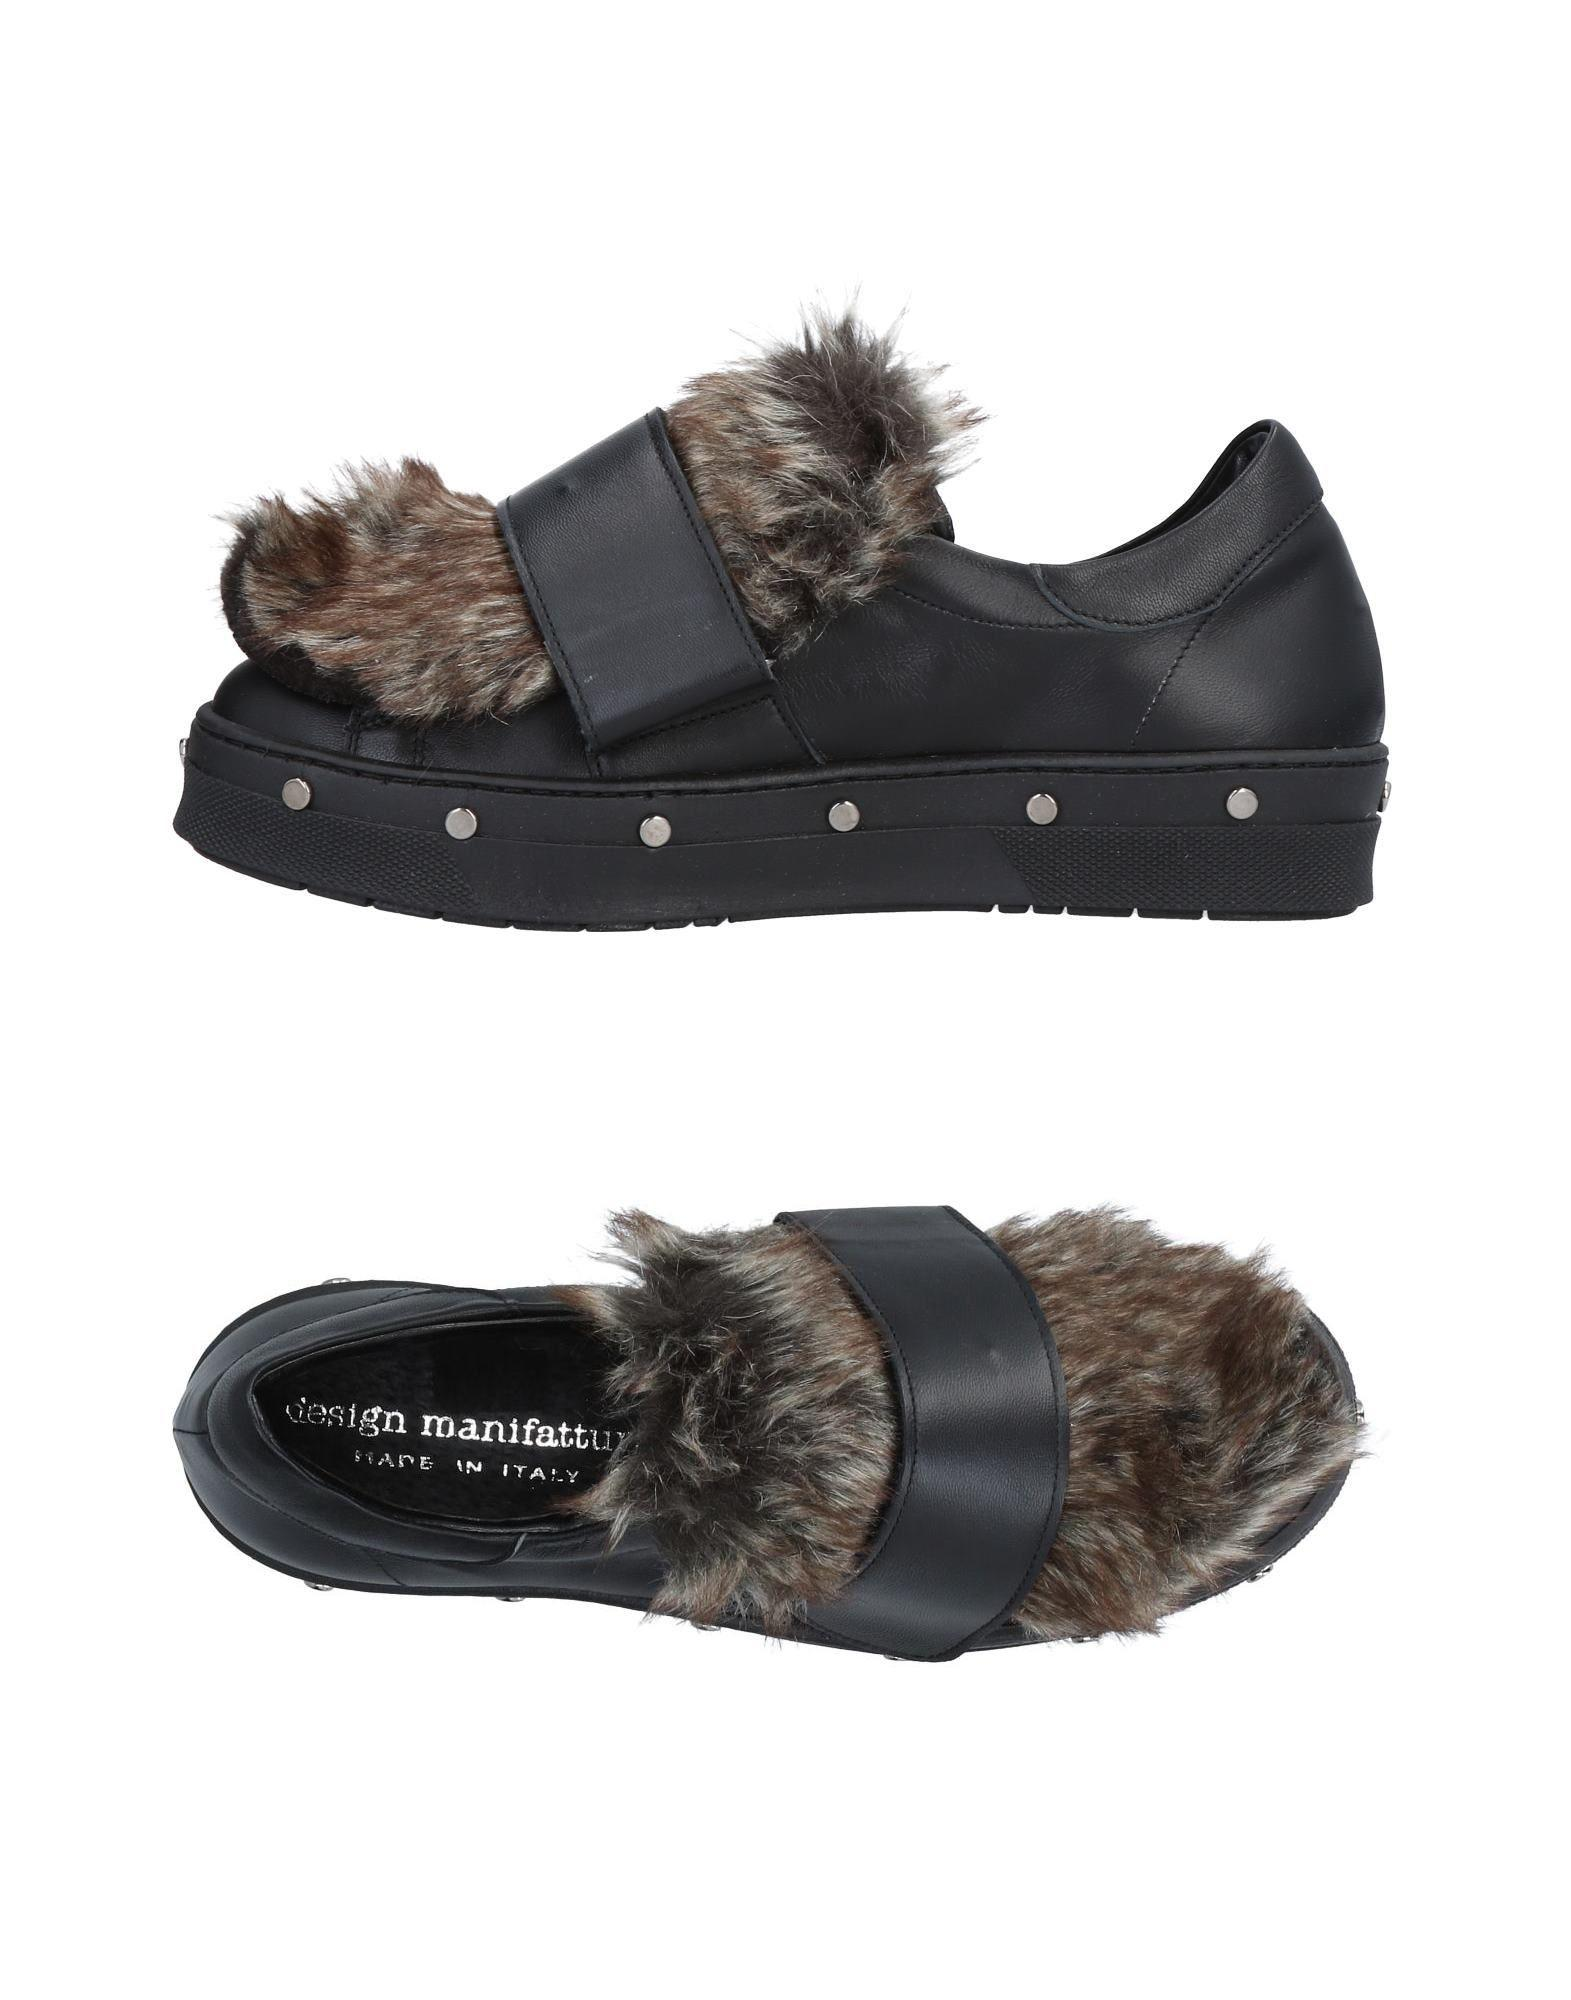 FOOTWEAR - Low-tops & sneakers Design Manifattura l7YIu2ih